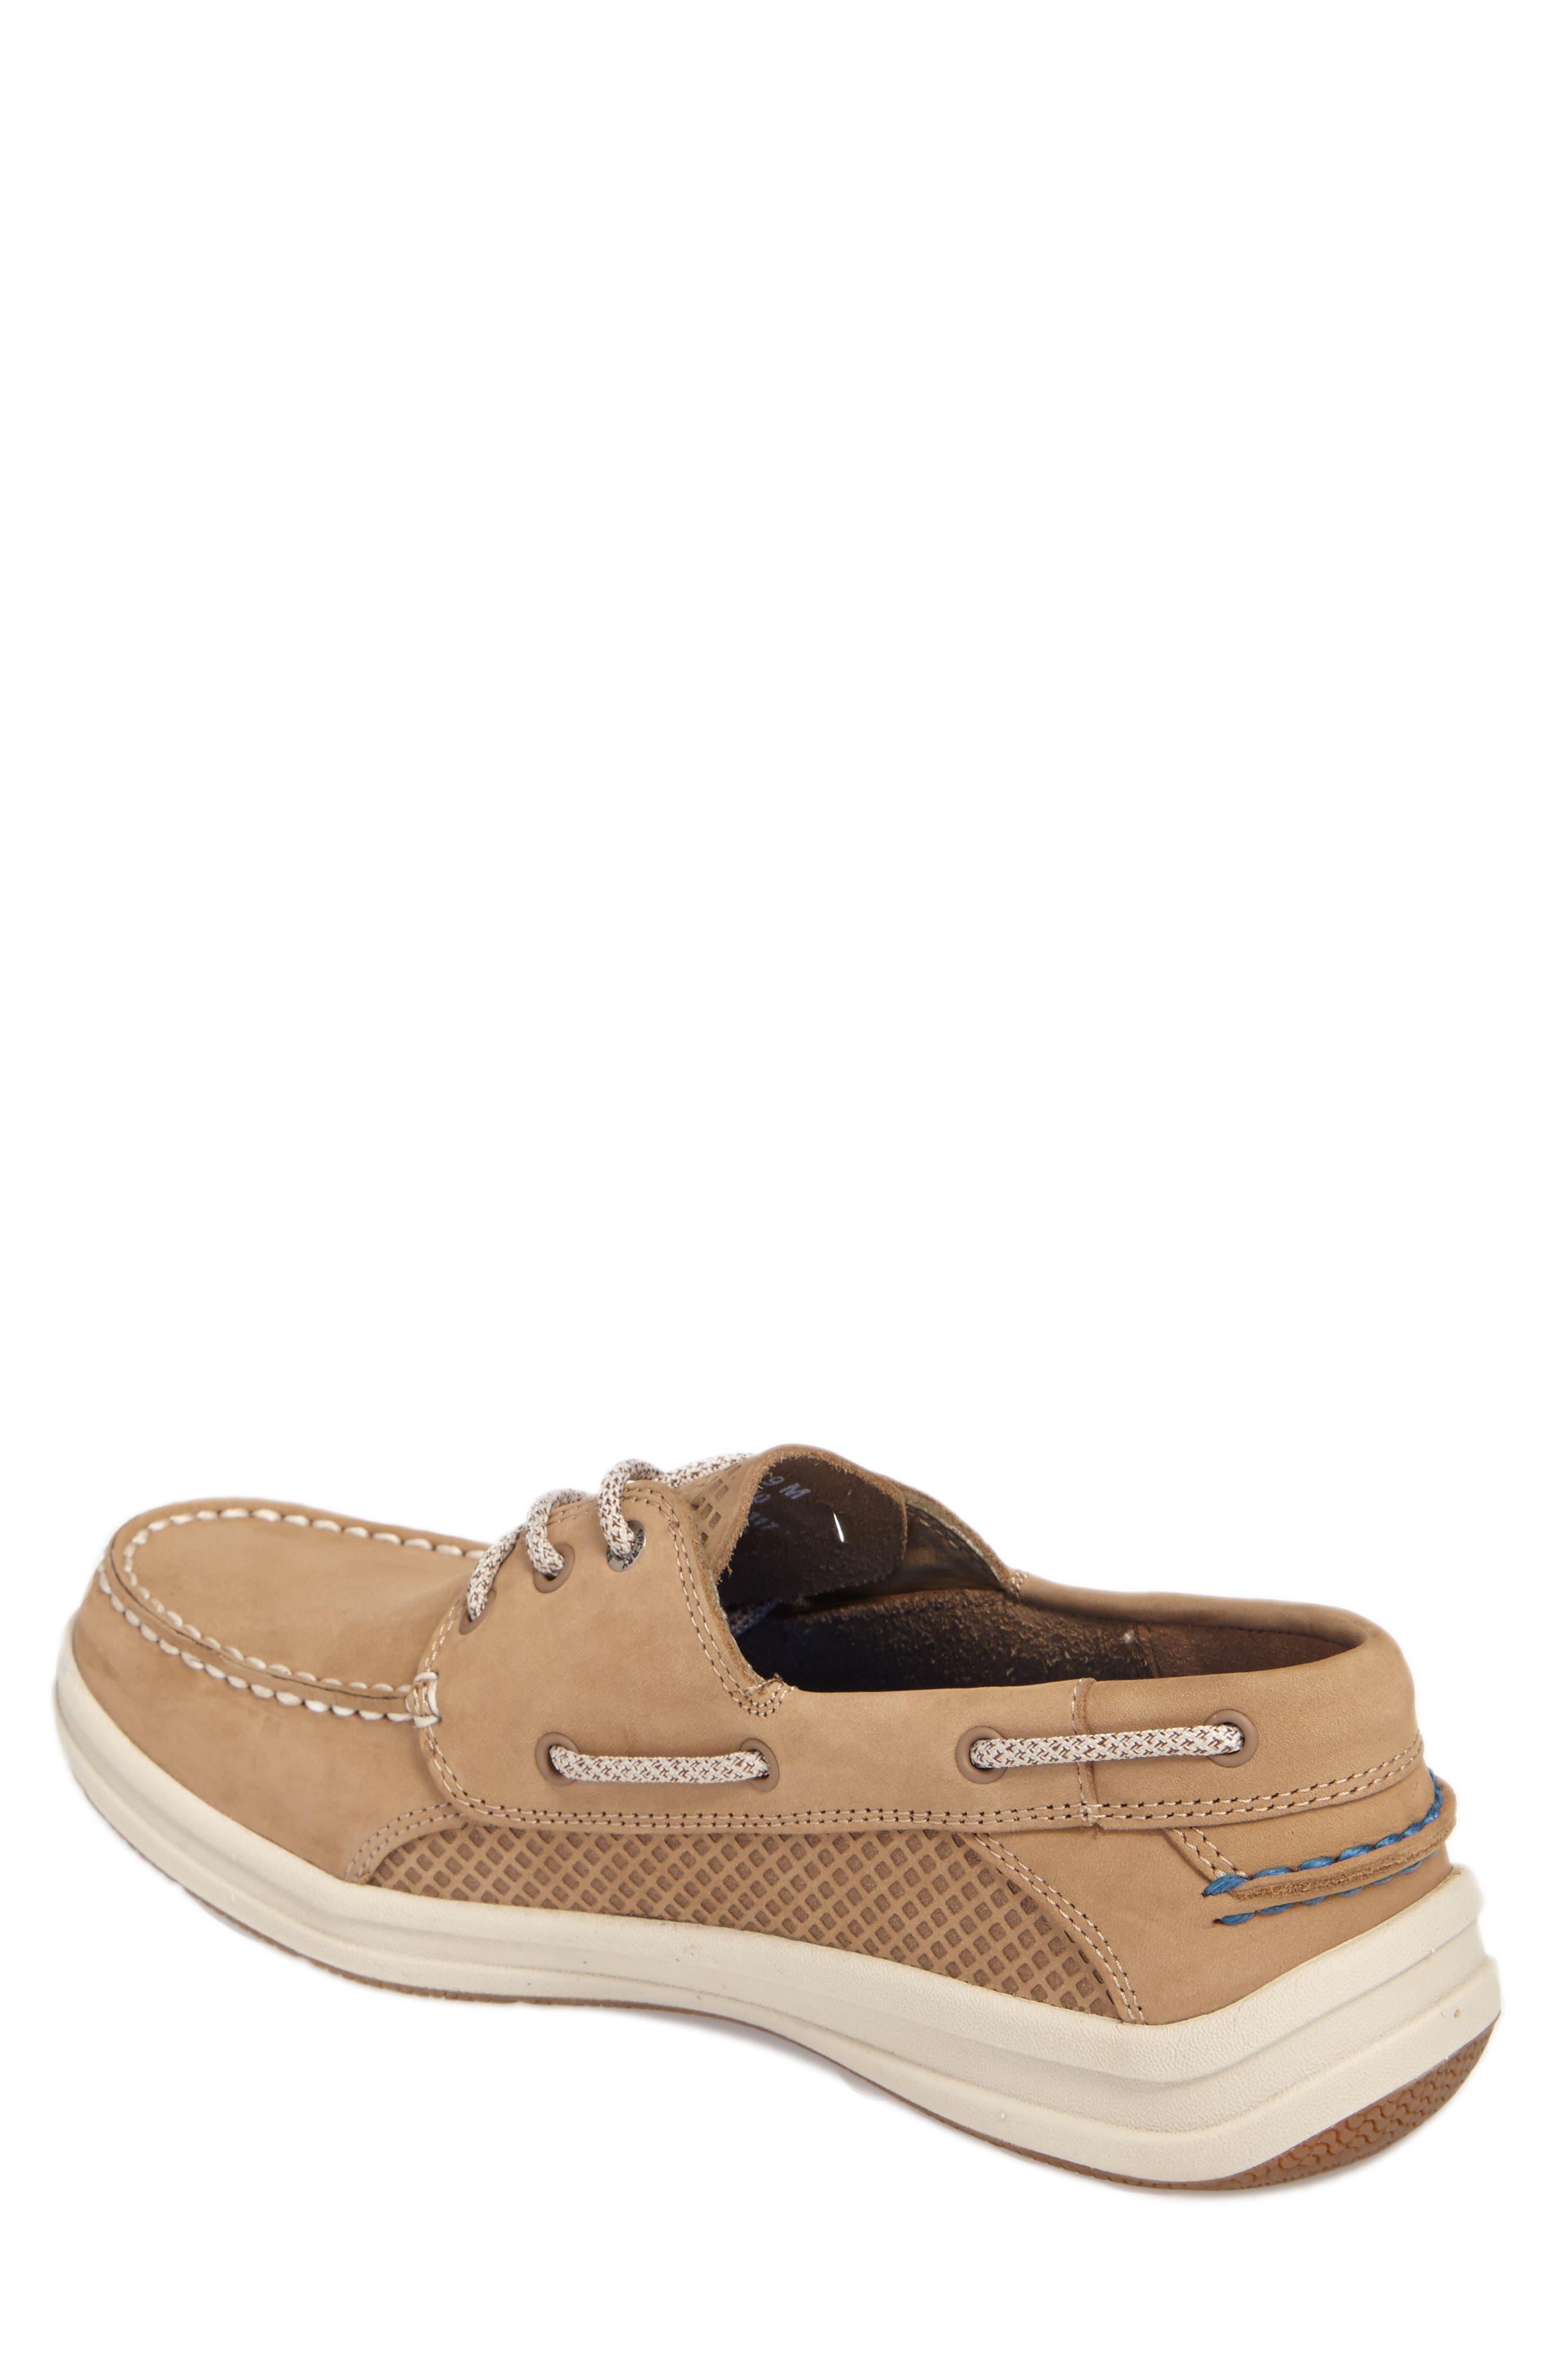 Gamefish Boat Shoe,                             Alternate thumbnail 2, color,                             Linen Leather